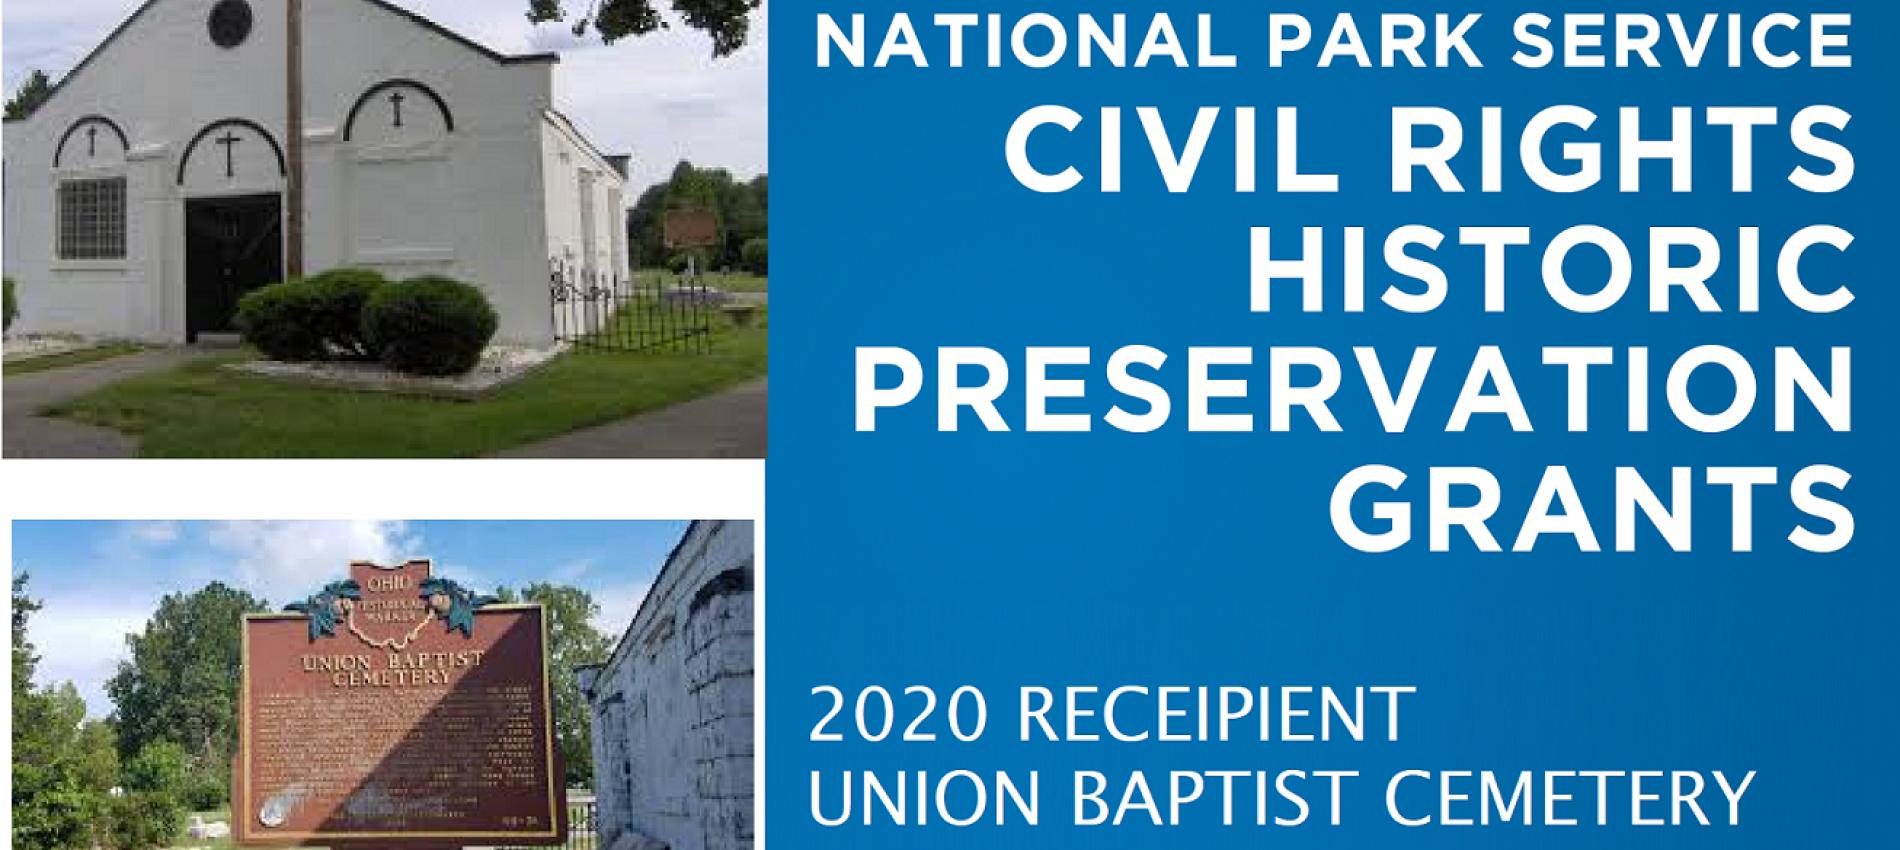 Union Baptist Cemetery Preservation Grant iii